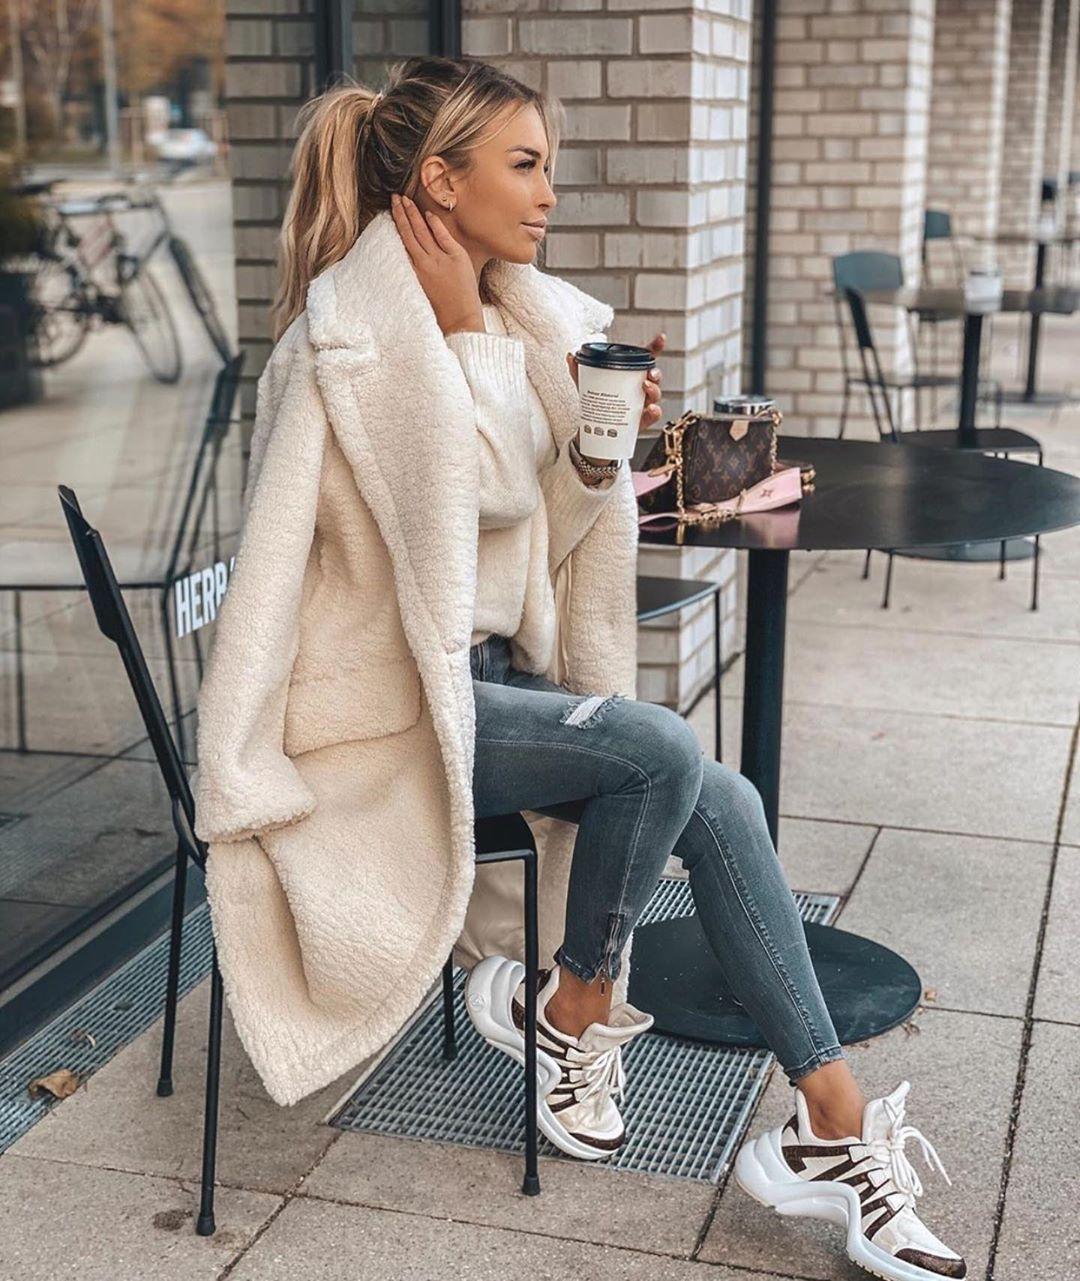 manteau effet mouton de Zara sur zara_streets